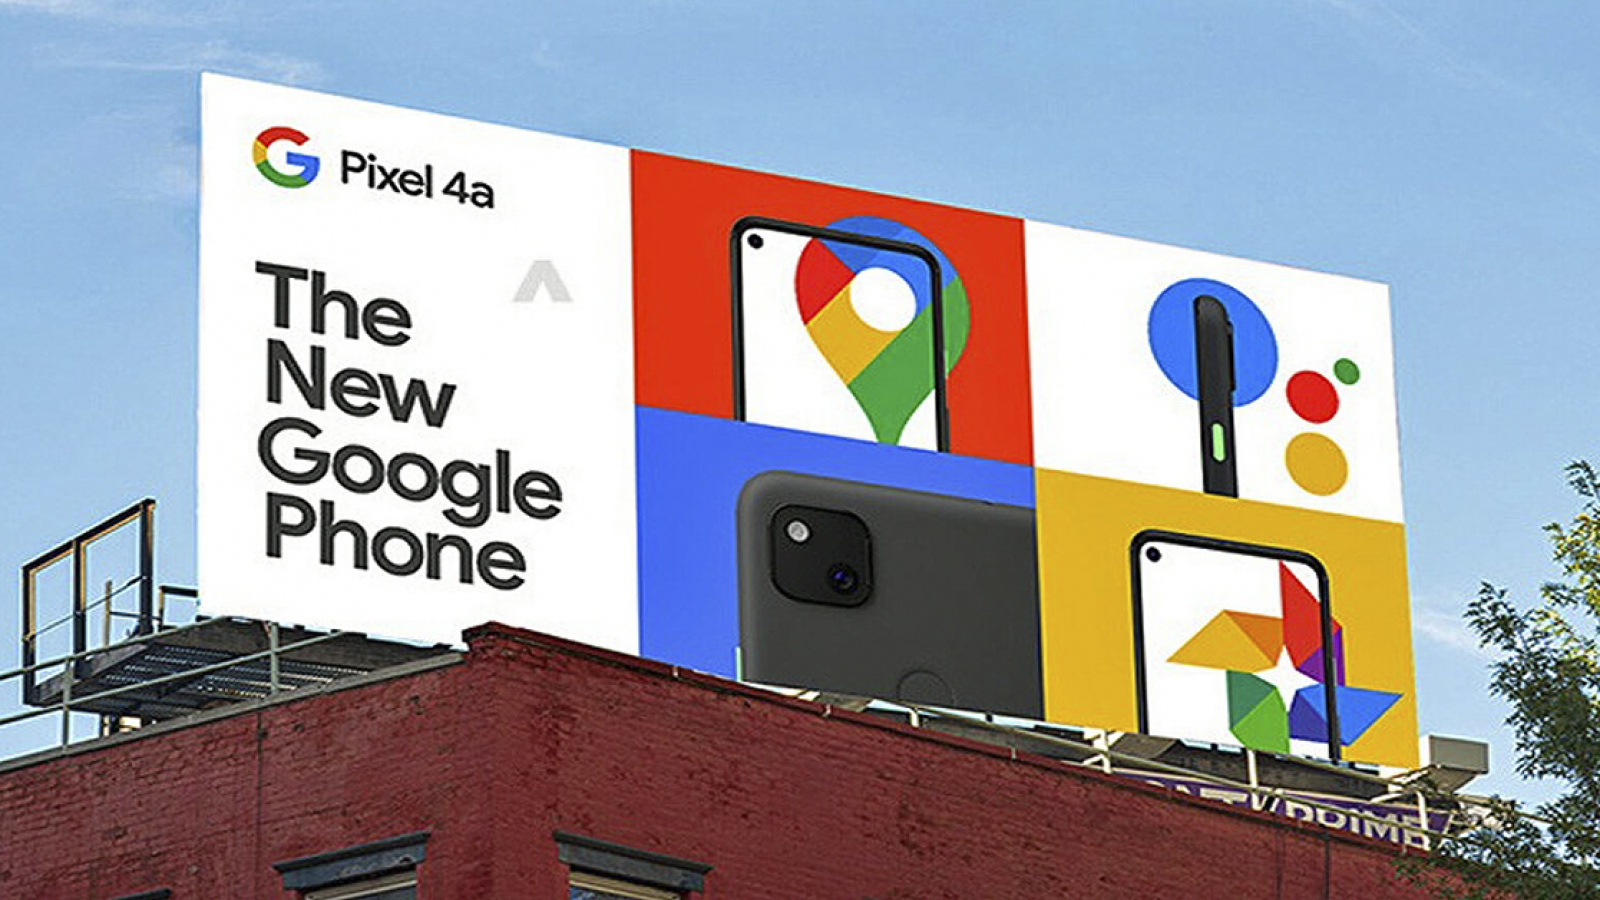 pixel-4a-a